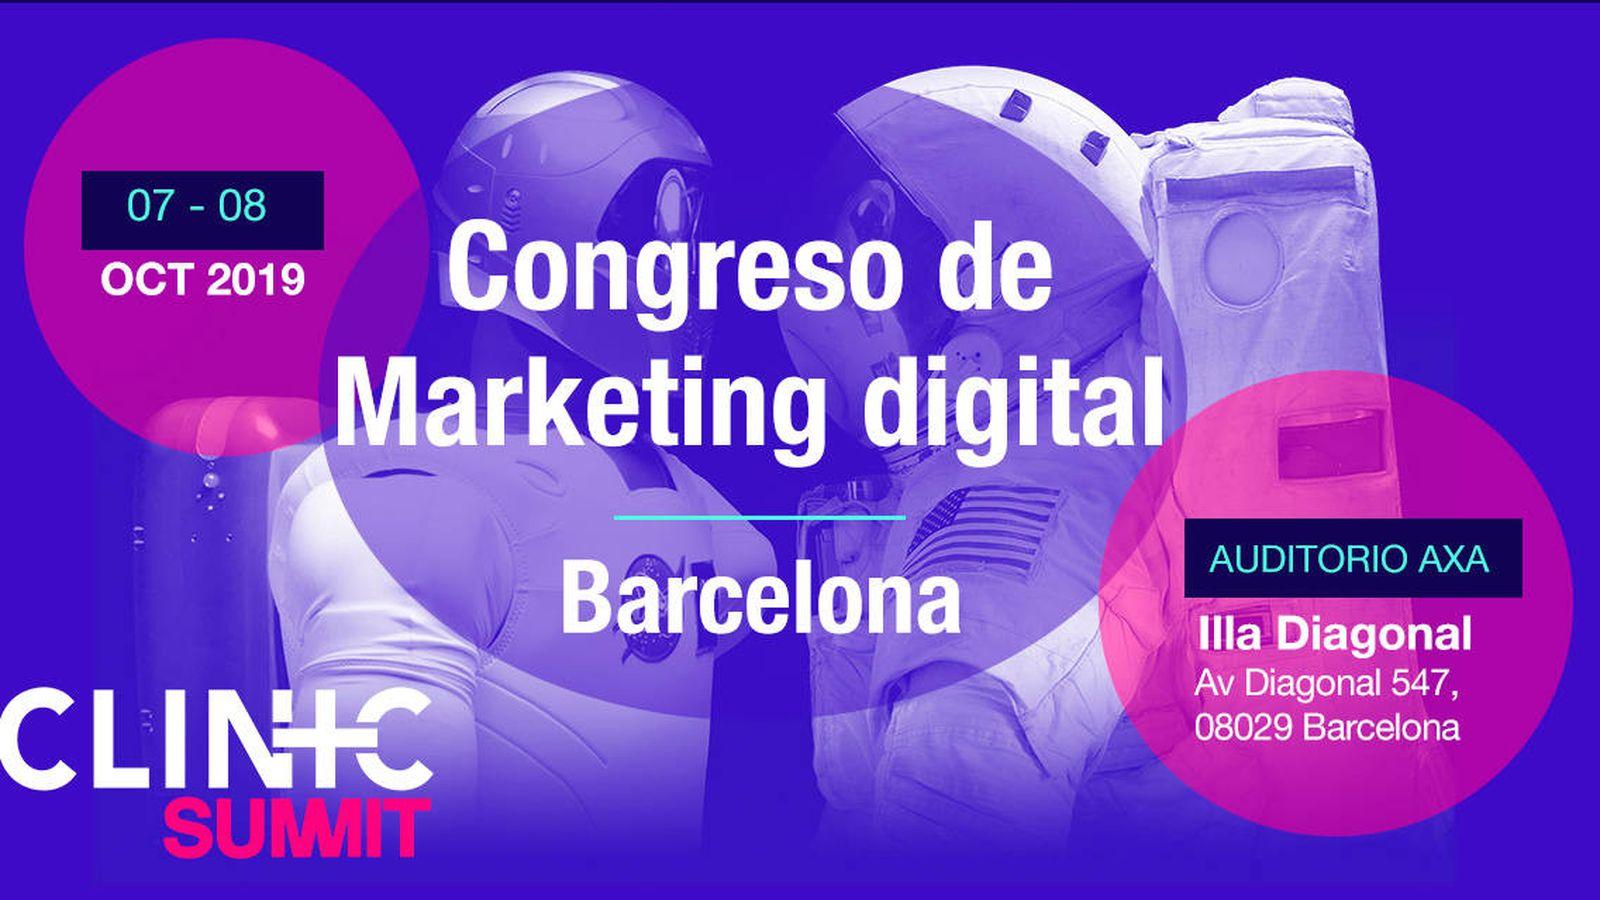 Foto: Congreso de Markeging Digital CLINIC (CLINIC)